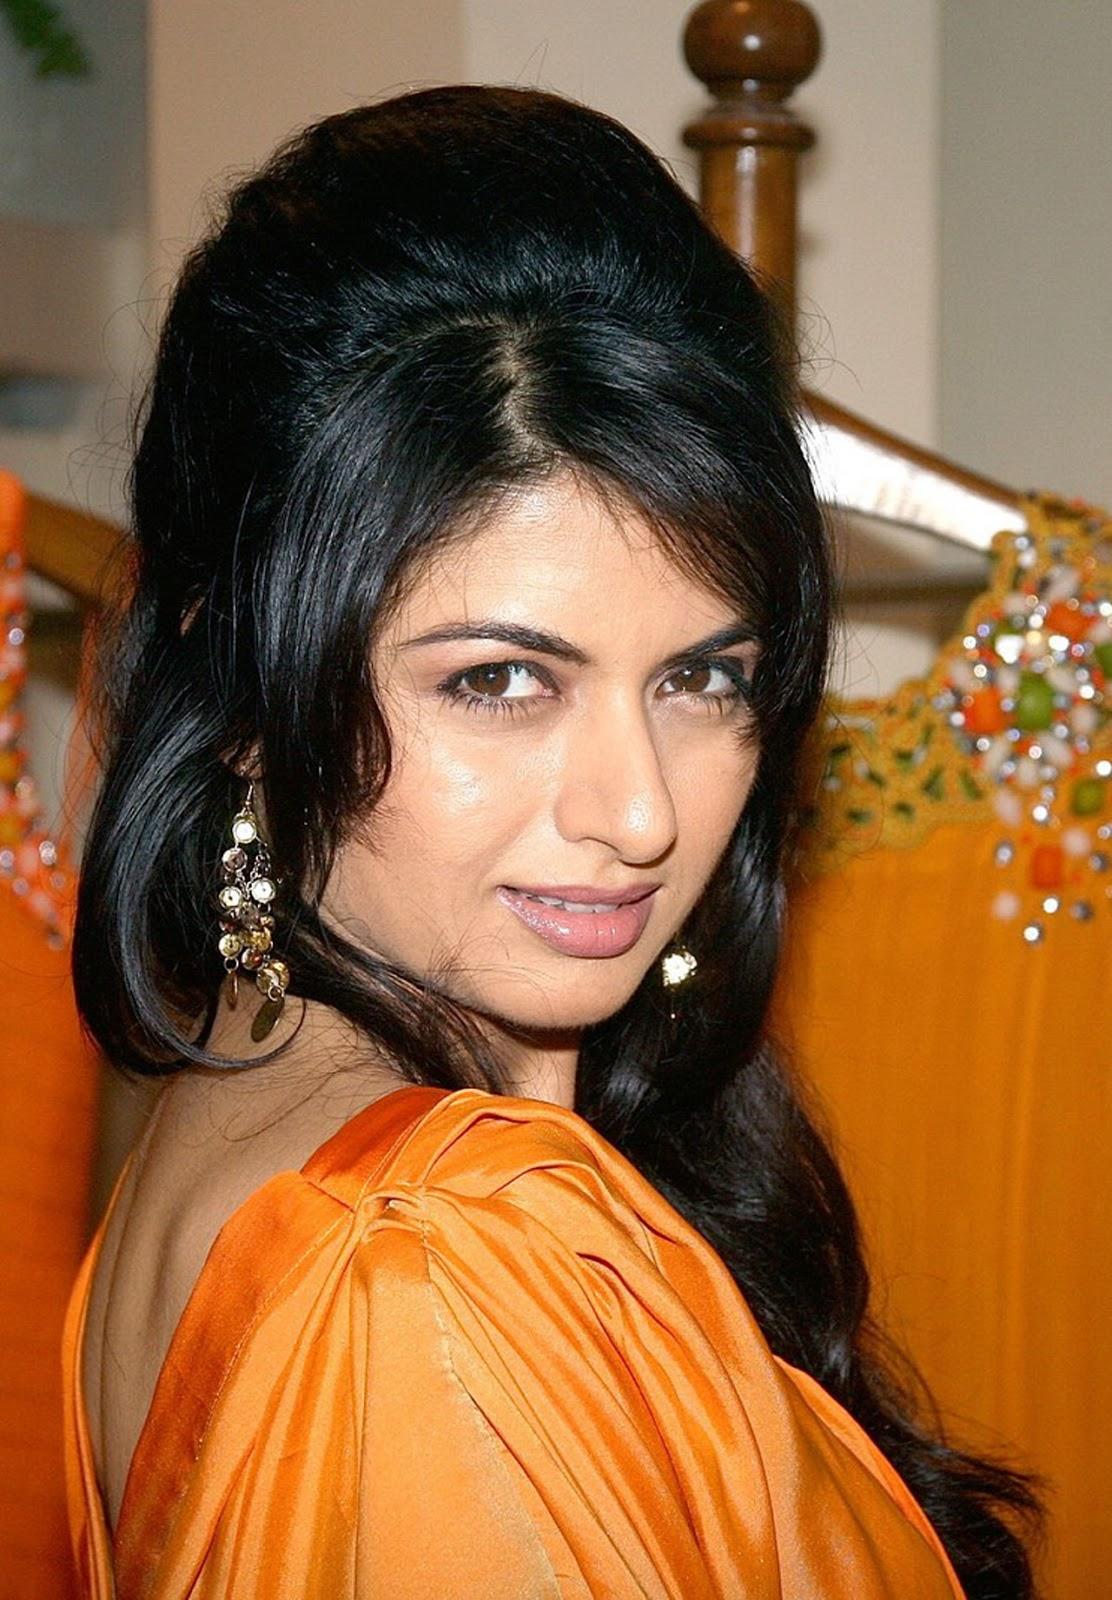 Bhagyashree patwardhan cute hairstyle pics